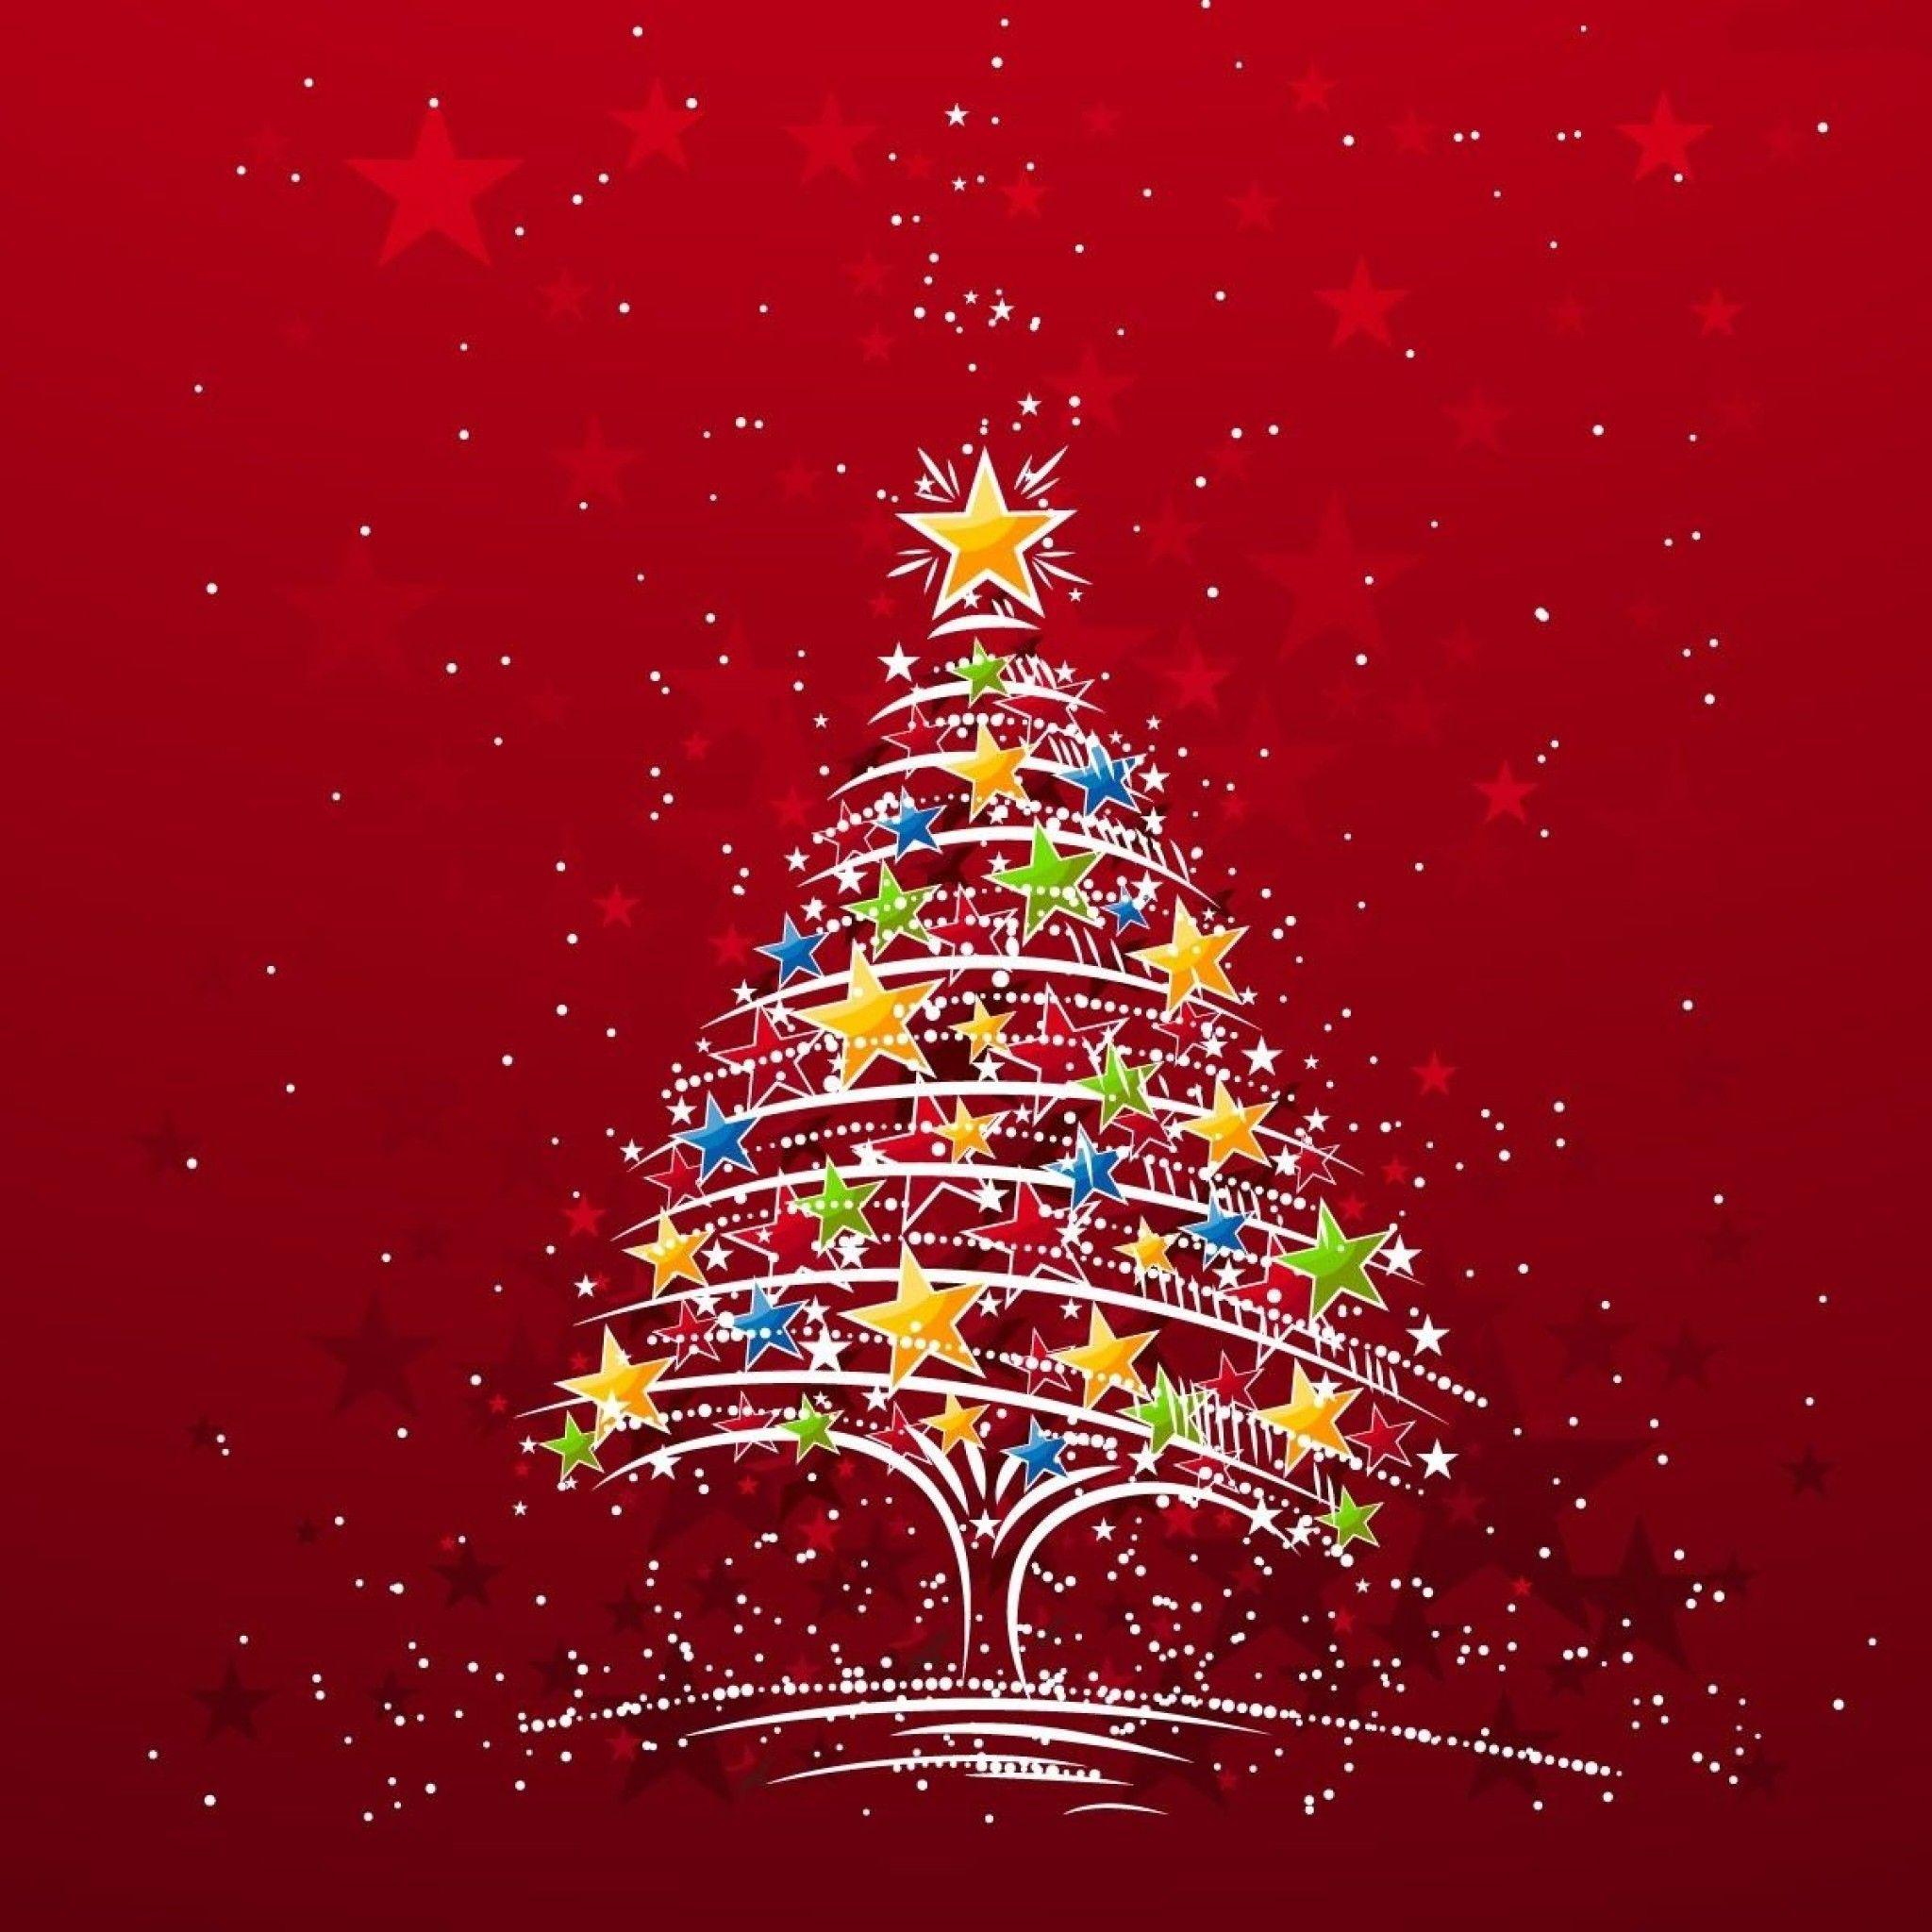 ipad air christmas wallpaper - Christmas Wallpaper For Ipad